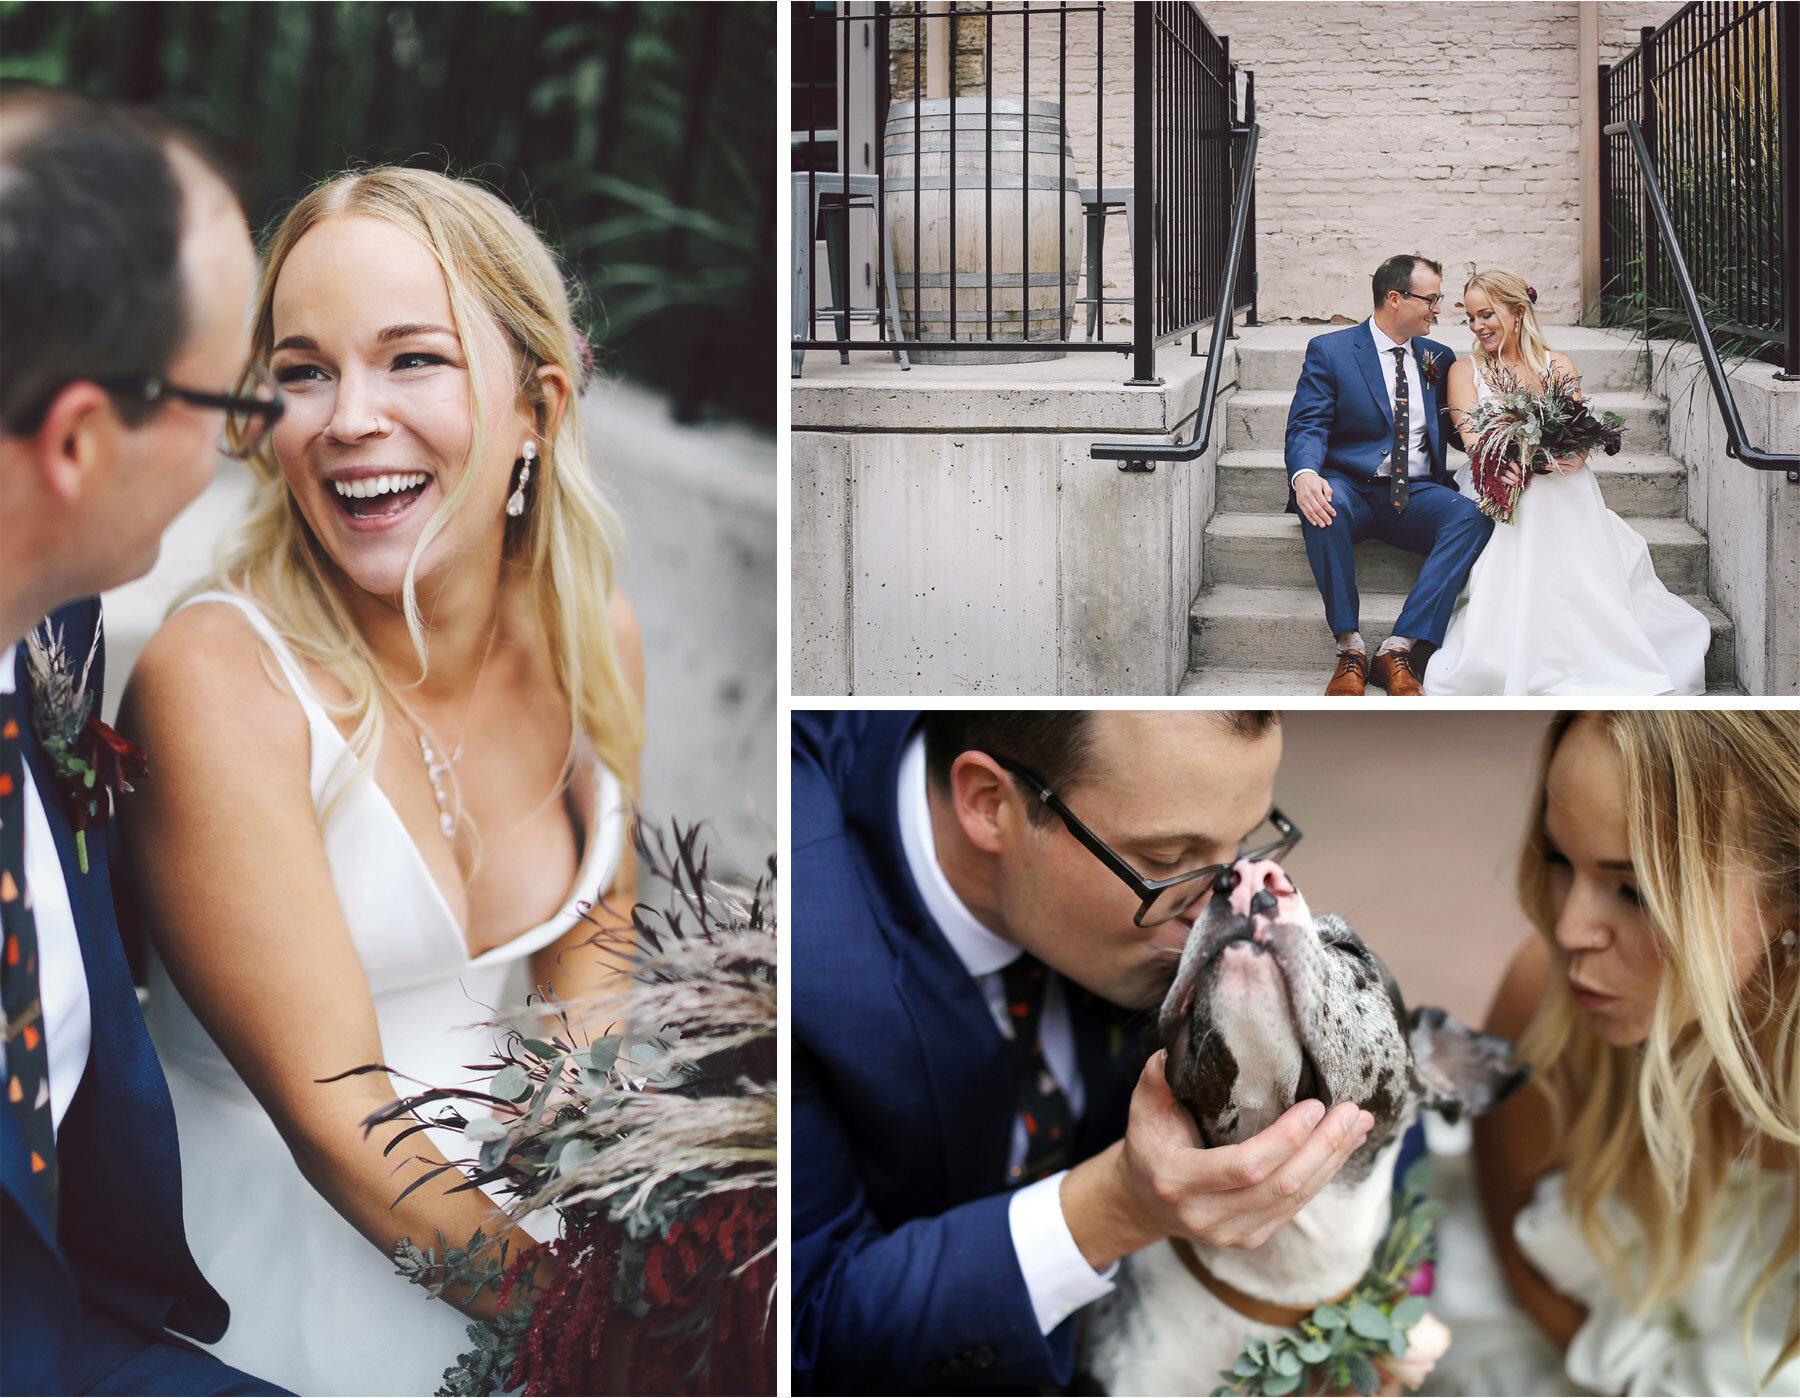 08-Vick-Photography-Wedding-Minneapolis-Minnesota-Bride-Groom-Dogs-Danielle-and-Tom.jpg